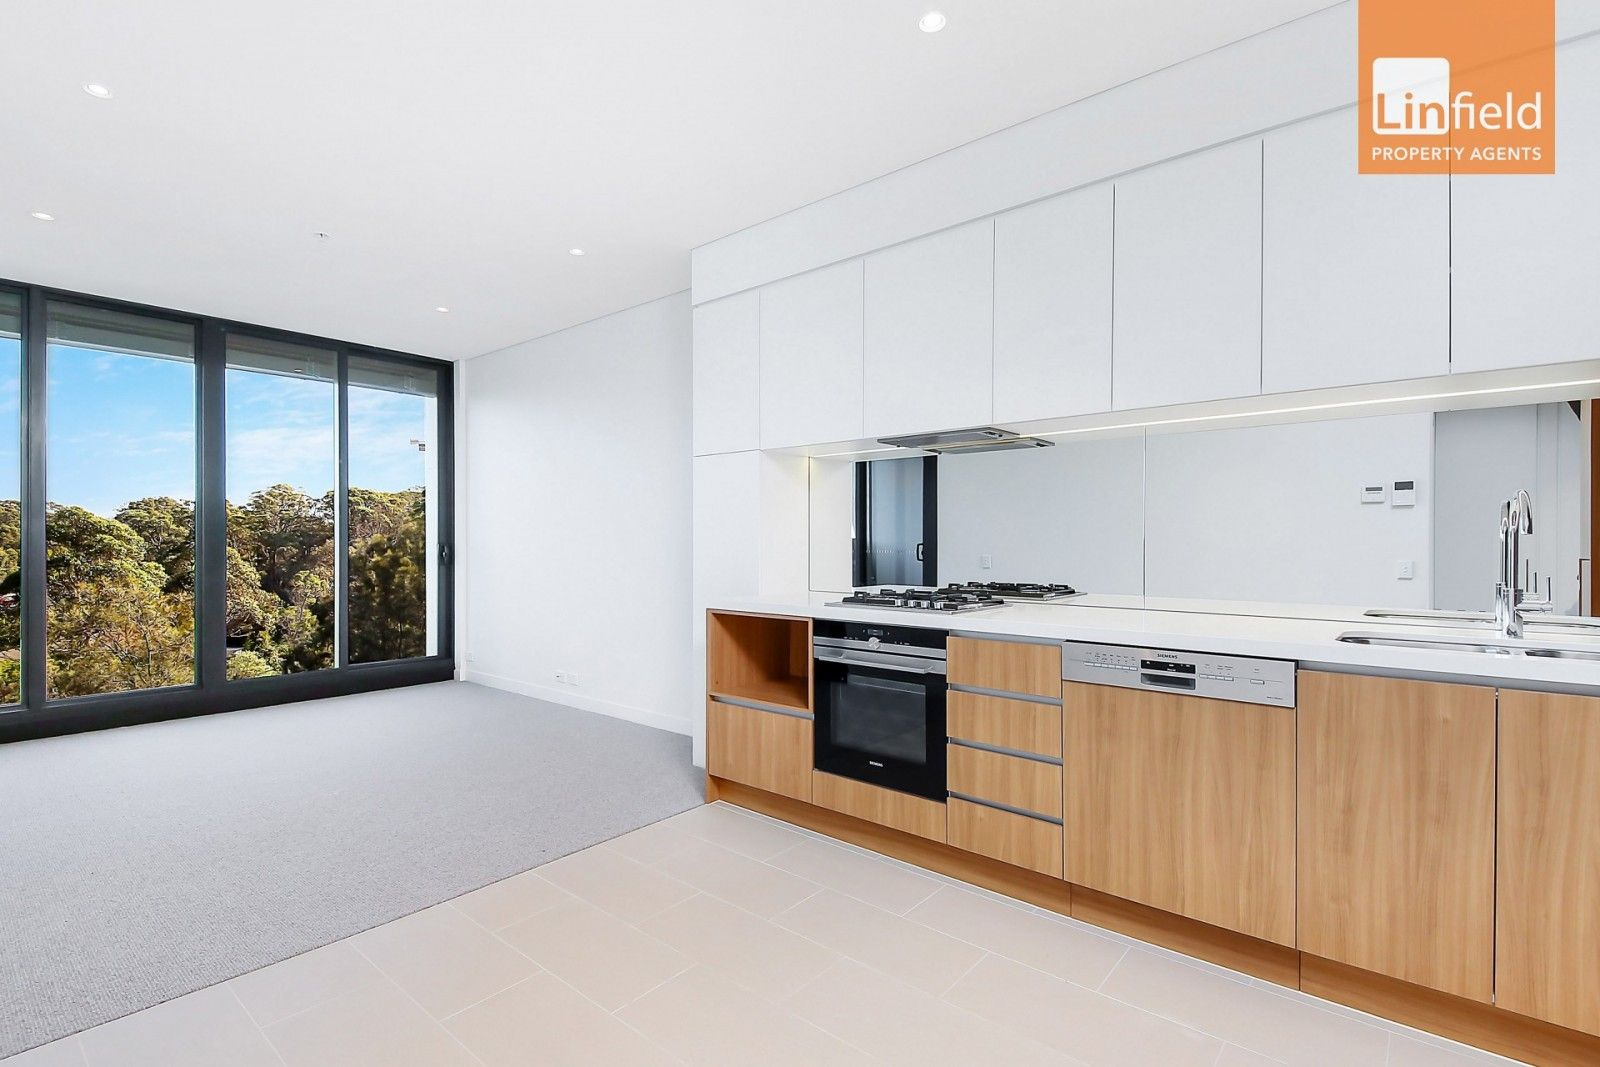 Level 3, C304/27-37 Delhi  Road, North Ryde NSW 2113, Image 0